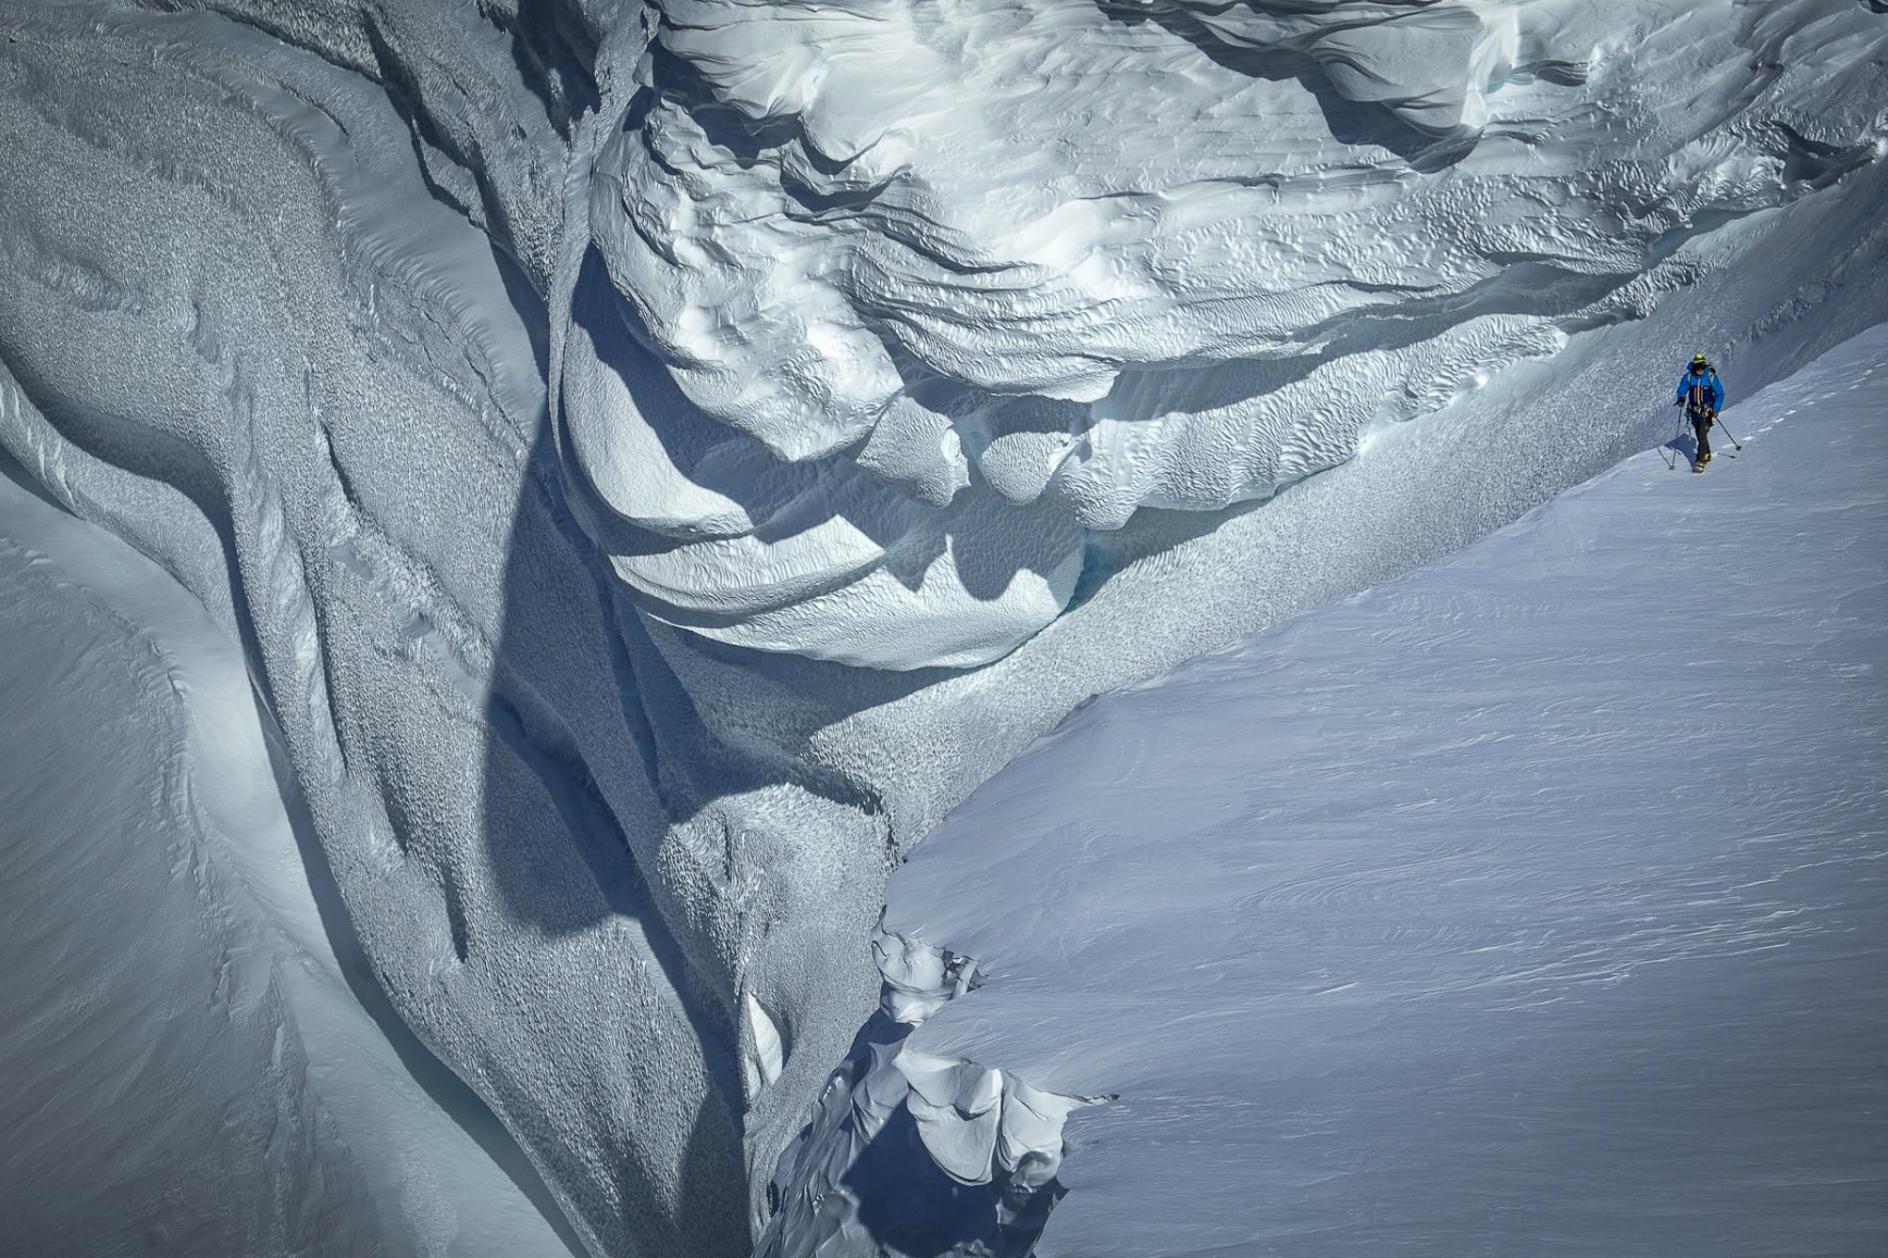 Cory-Richards-Photographer-Antarctica-21.jpg